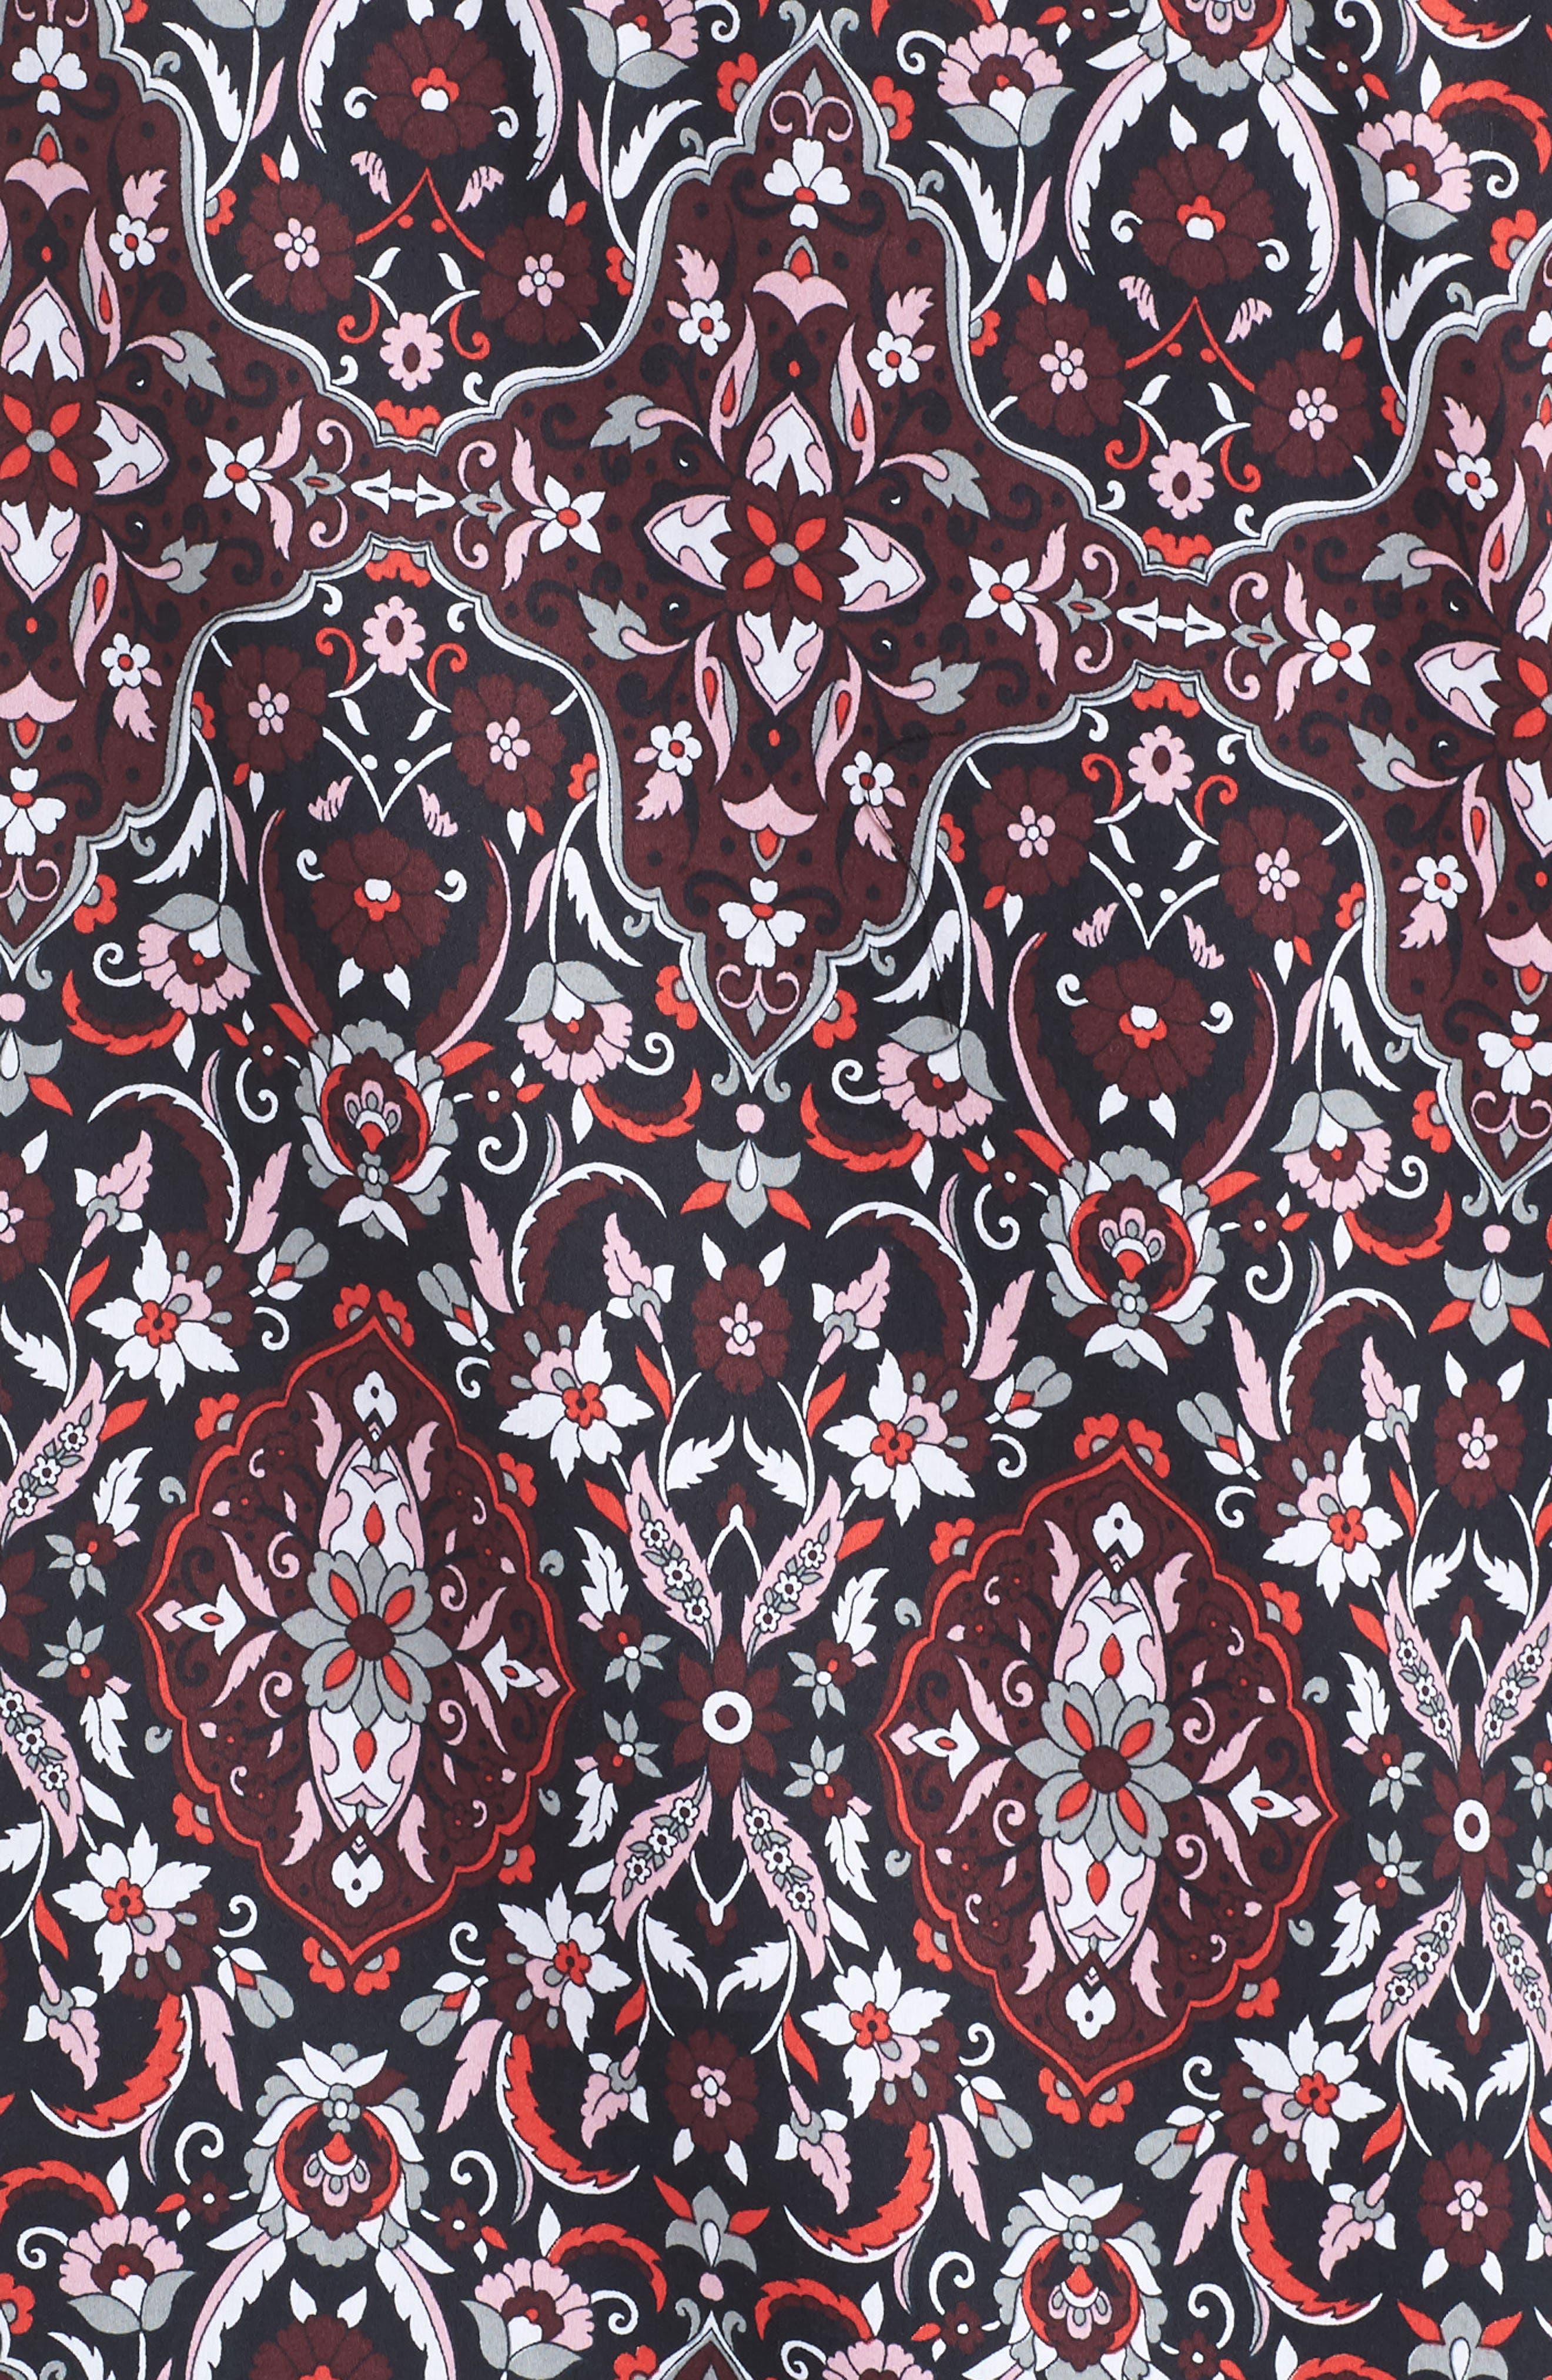 Ava Heirloom Paisley Print Cotton Shirt,                             Alternate thumbnail 5, color,                             Multi